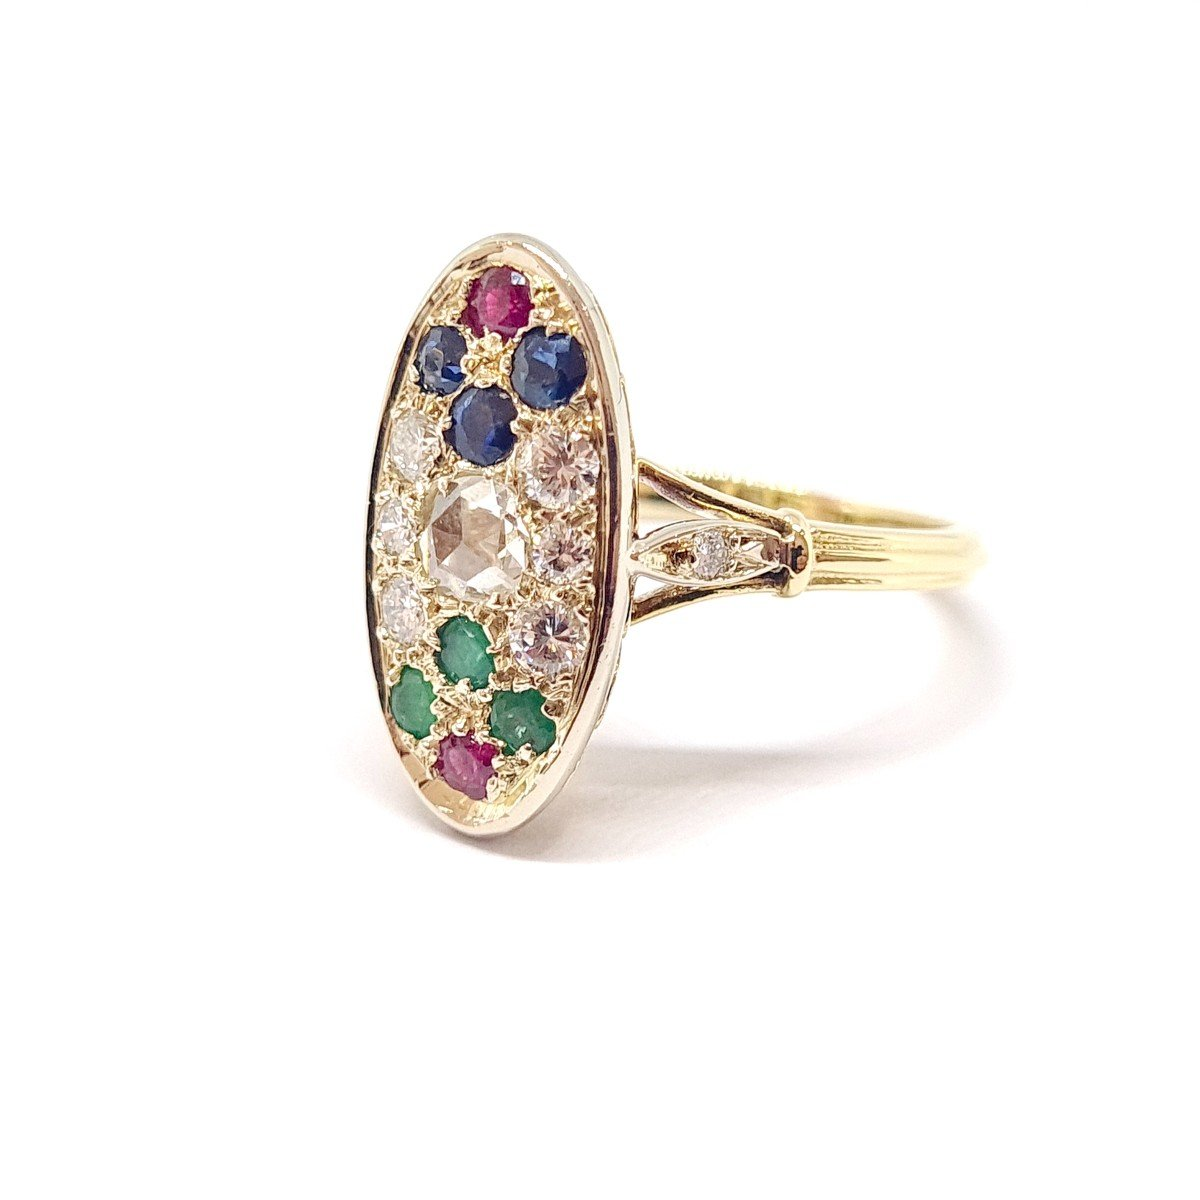 Bague Ancienne Or Jaune 18 Carats Diamants Saphirs Rubis émeraudes-photo-2